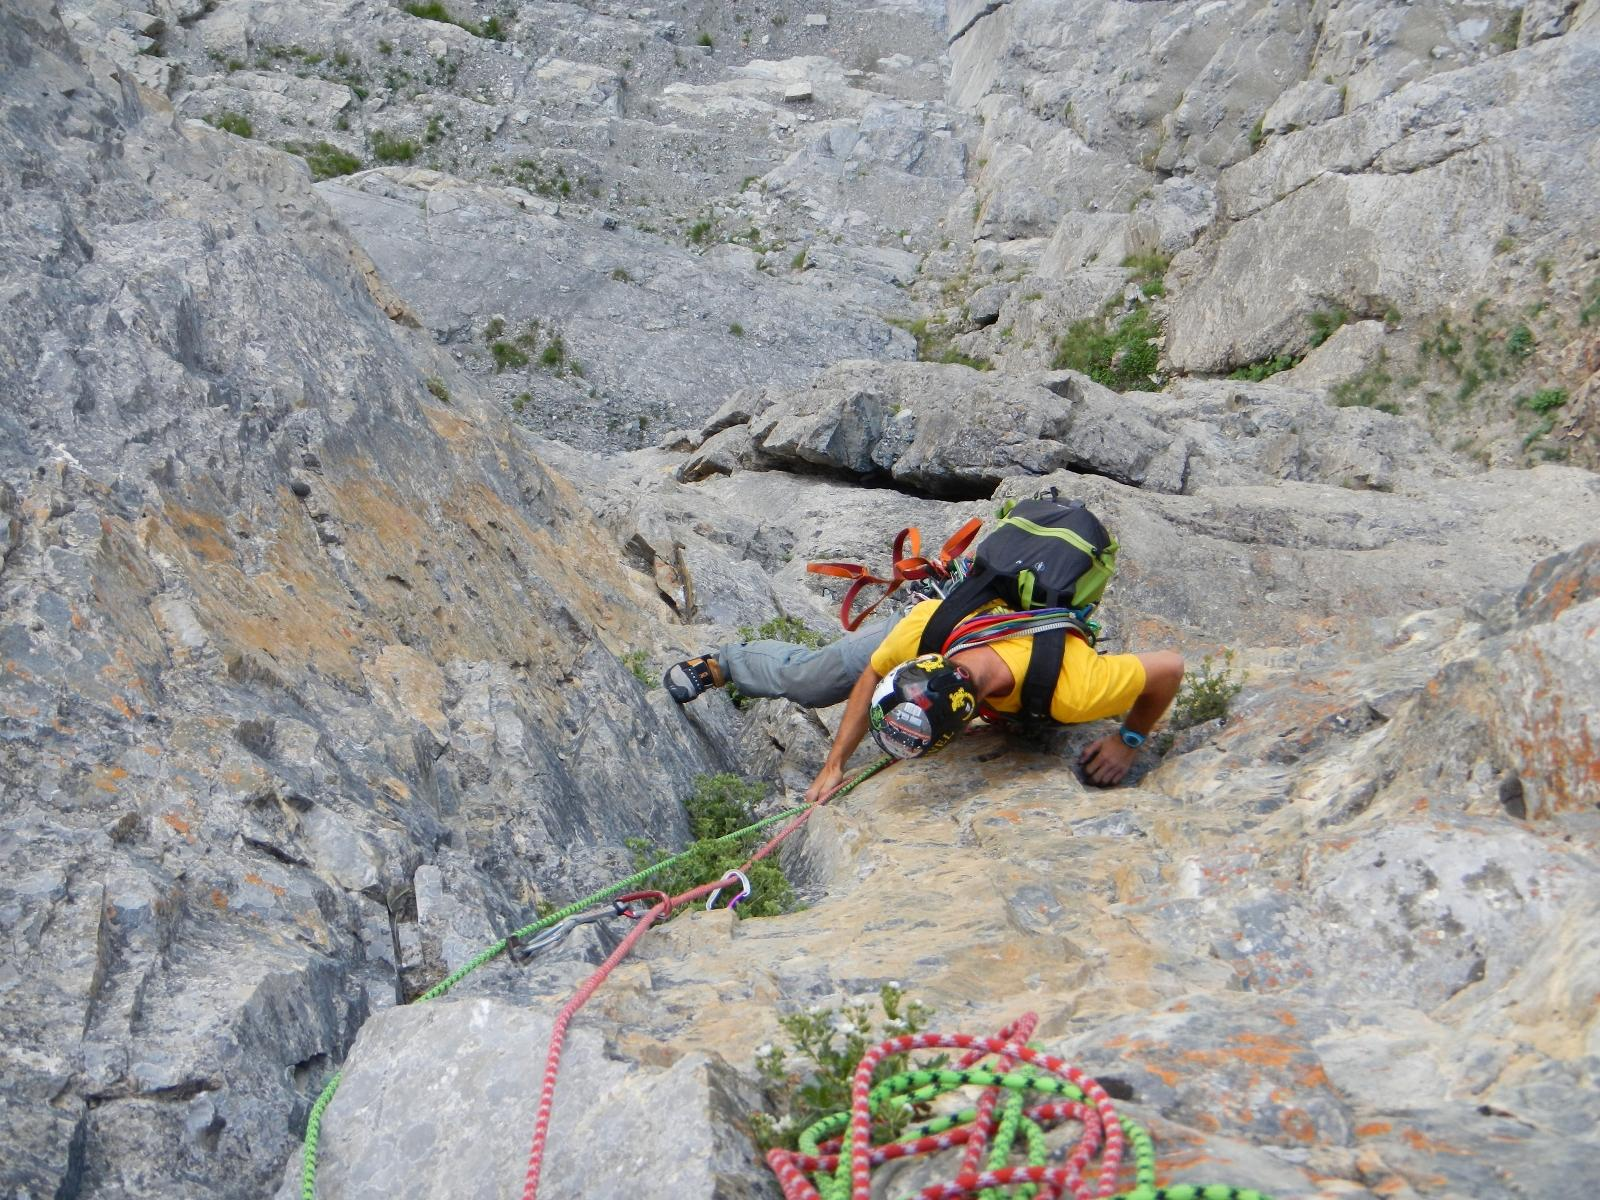 bei passi di arrampicata